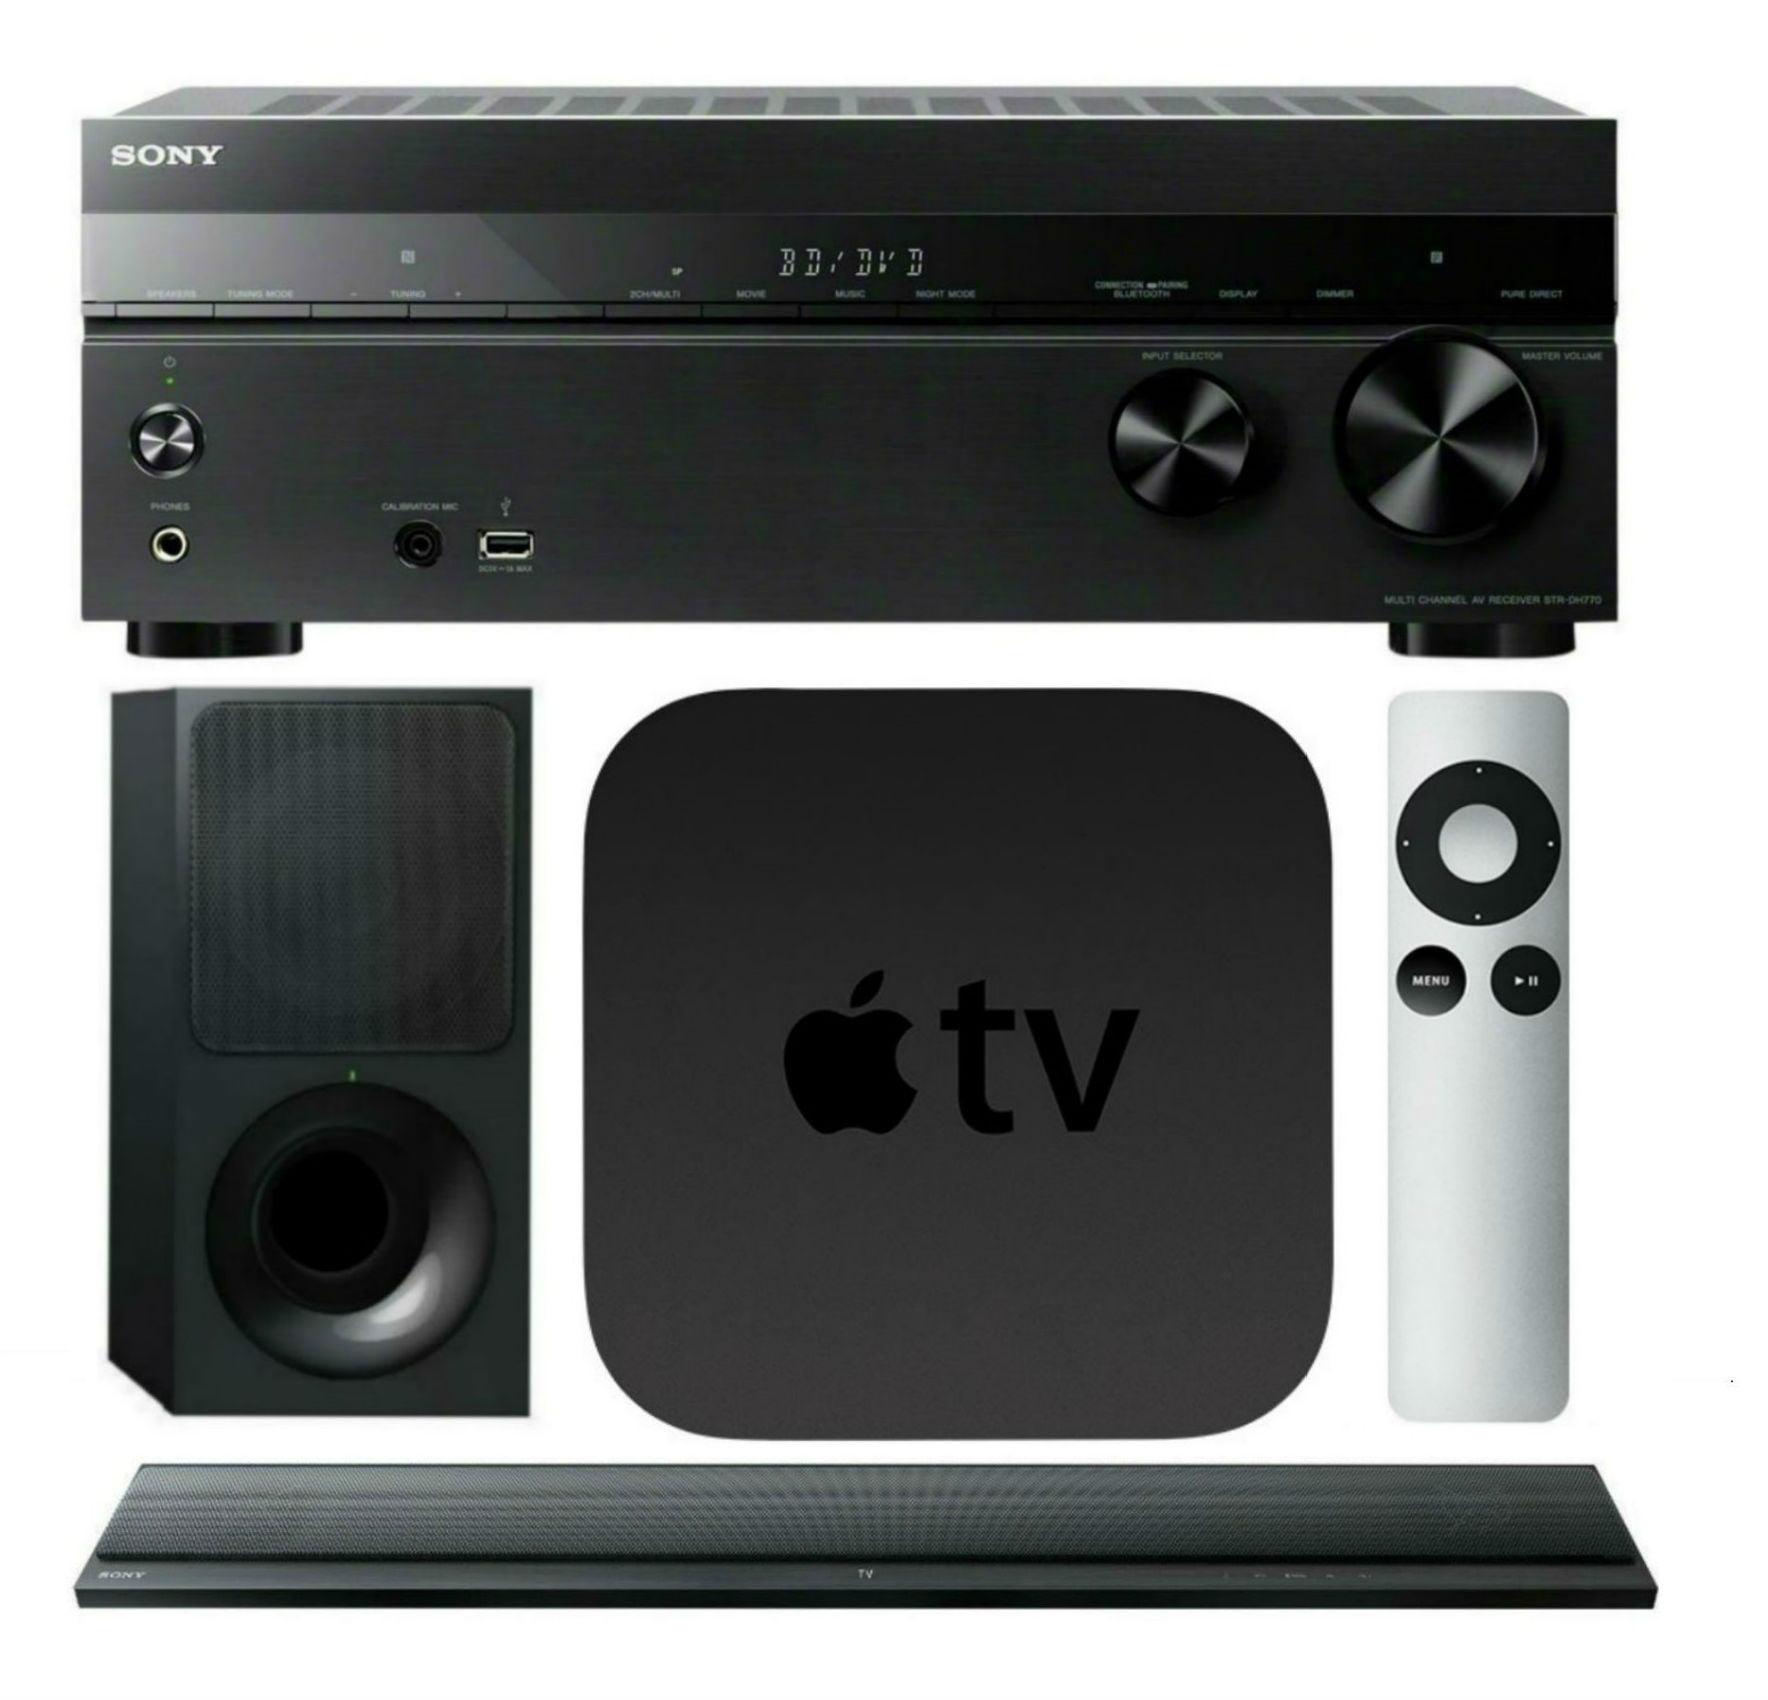 Sony STRDH770 Home Theater AVReceiver, HTCT390 SoundBar w/ Apple TV 3rd Gen